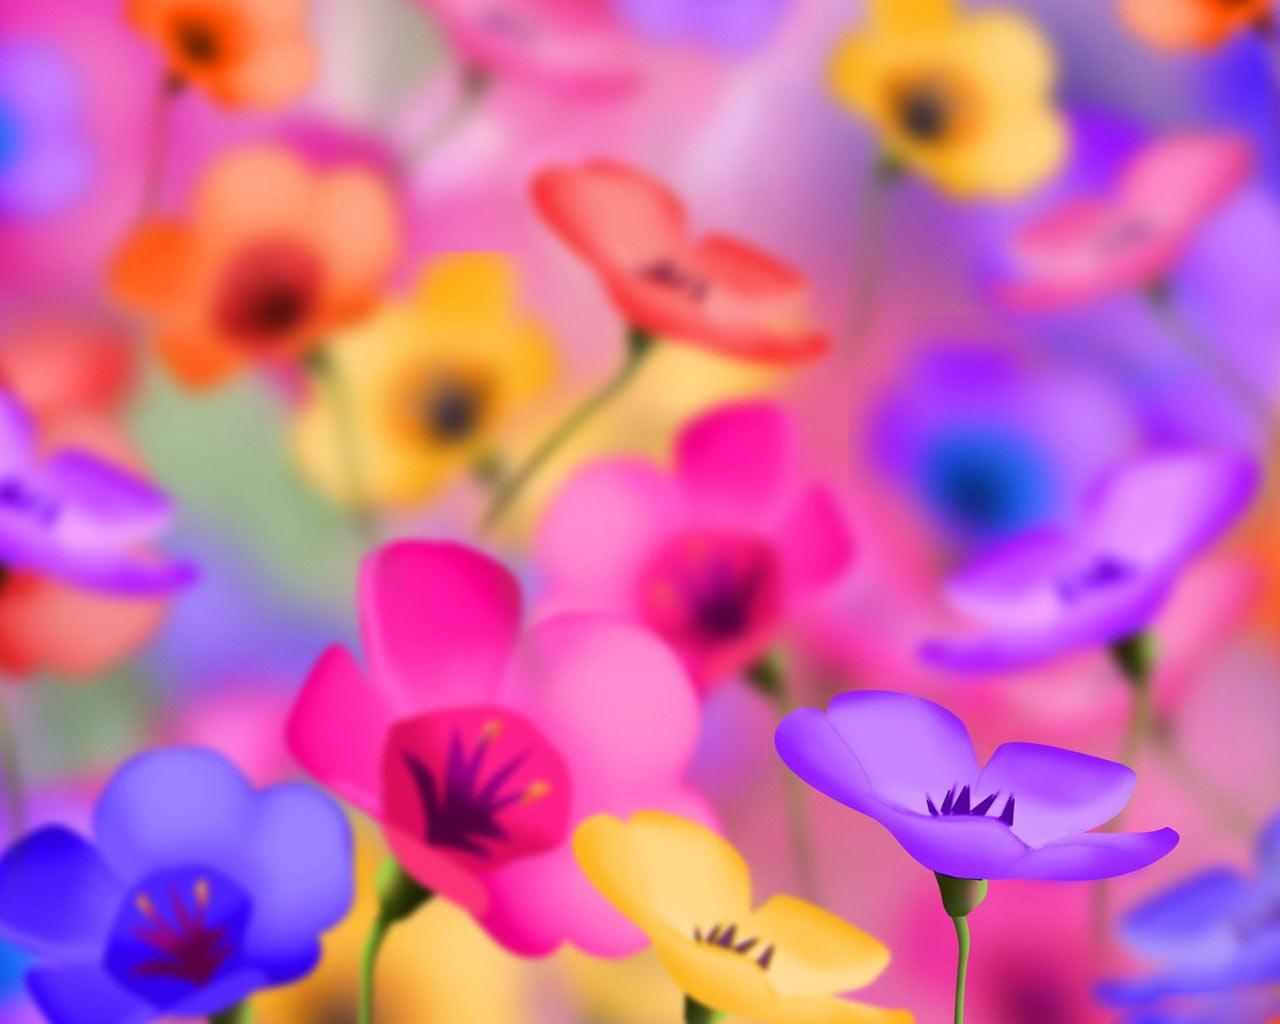 colorful desktop wallpaperamazing nature wallpapersamazing picture 1280x1024